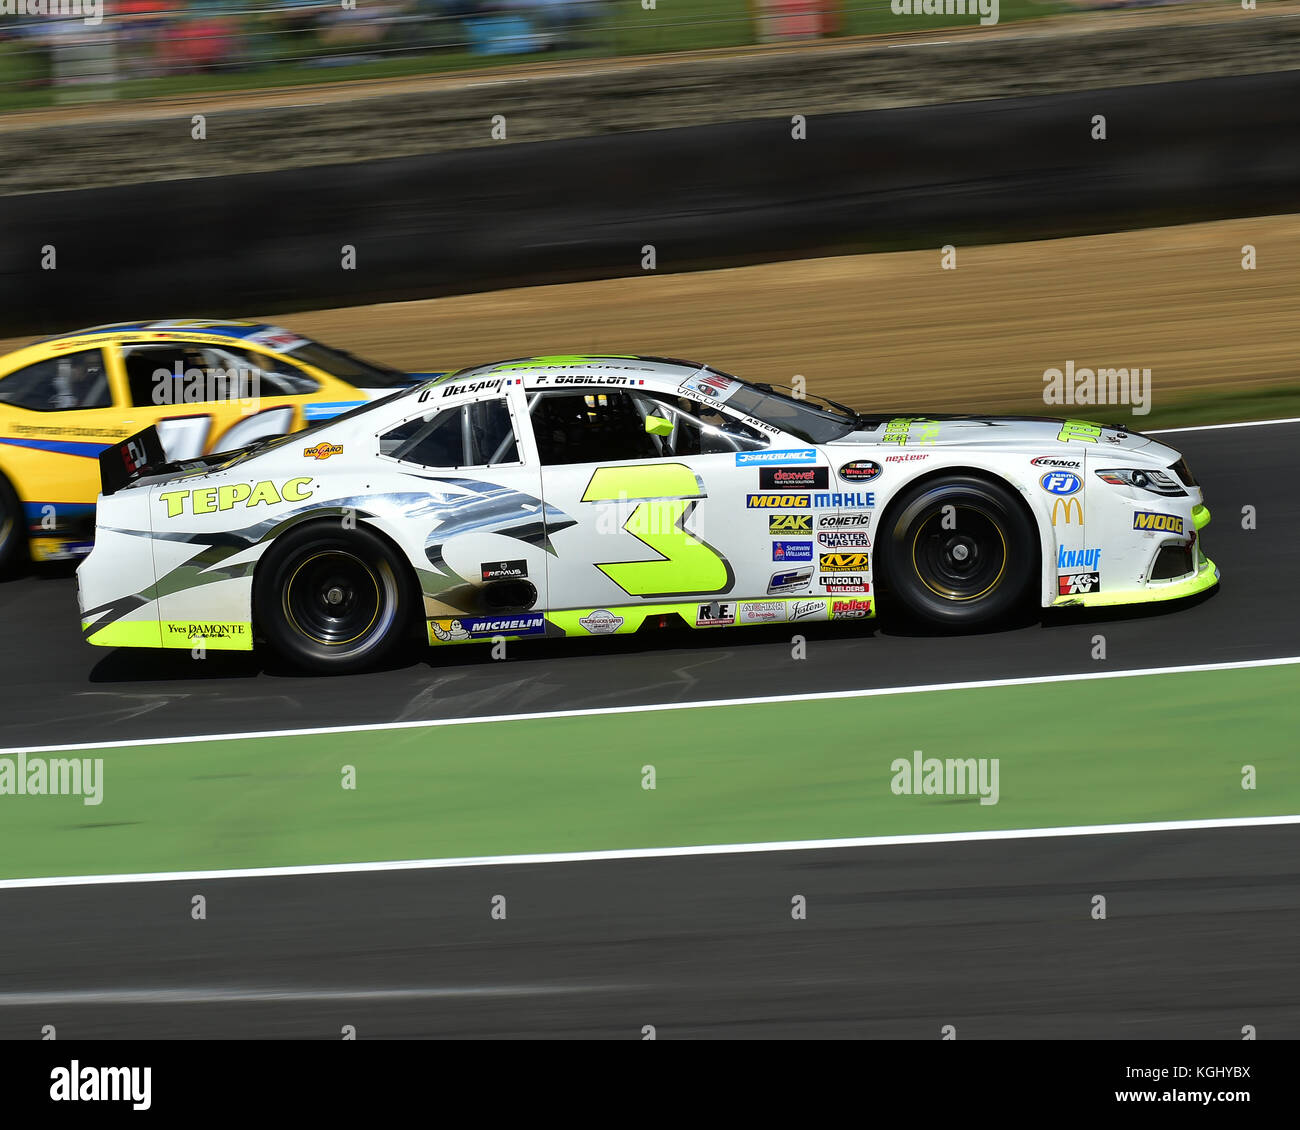 Ulysse Delsaux Toyota Camry Nascar Whelen Euro Series Elite 2